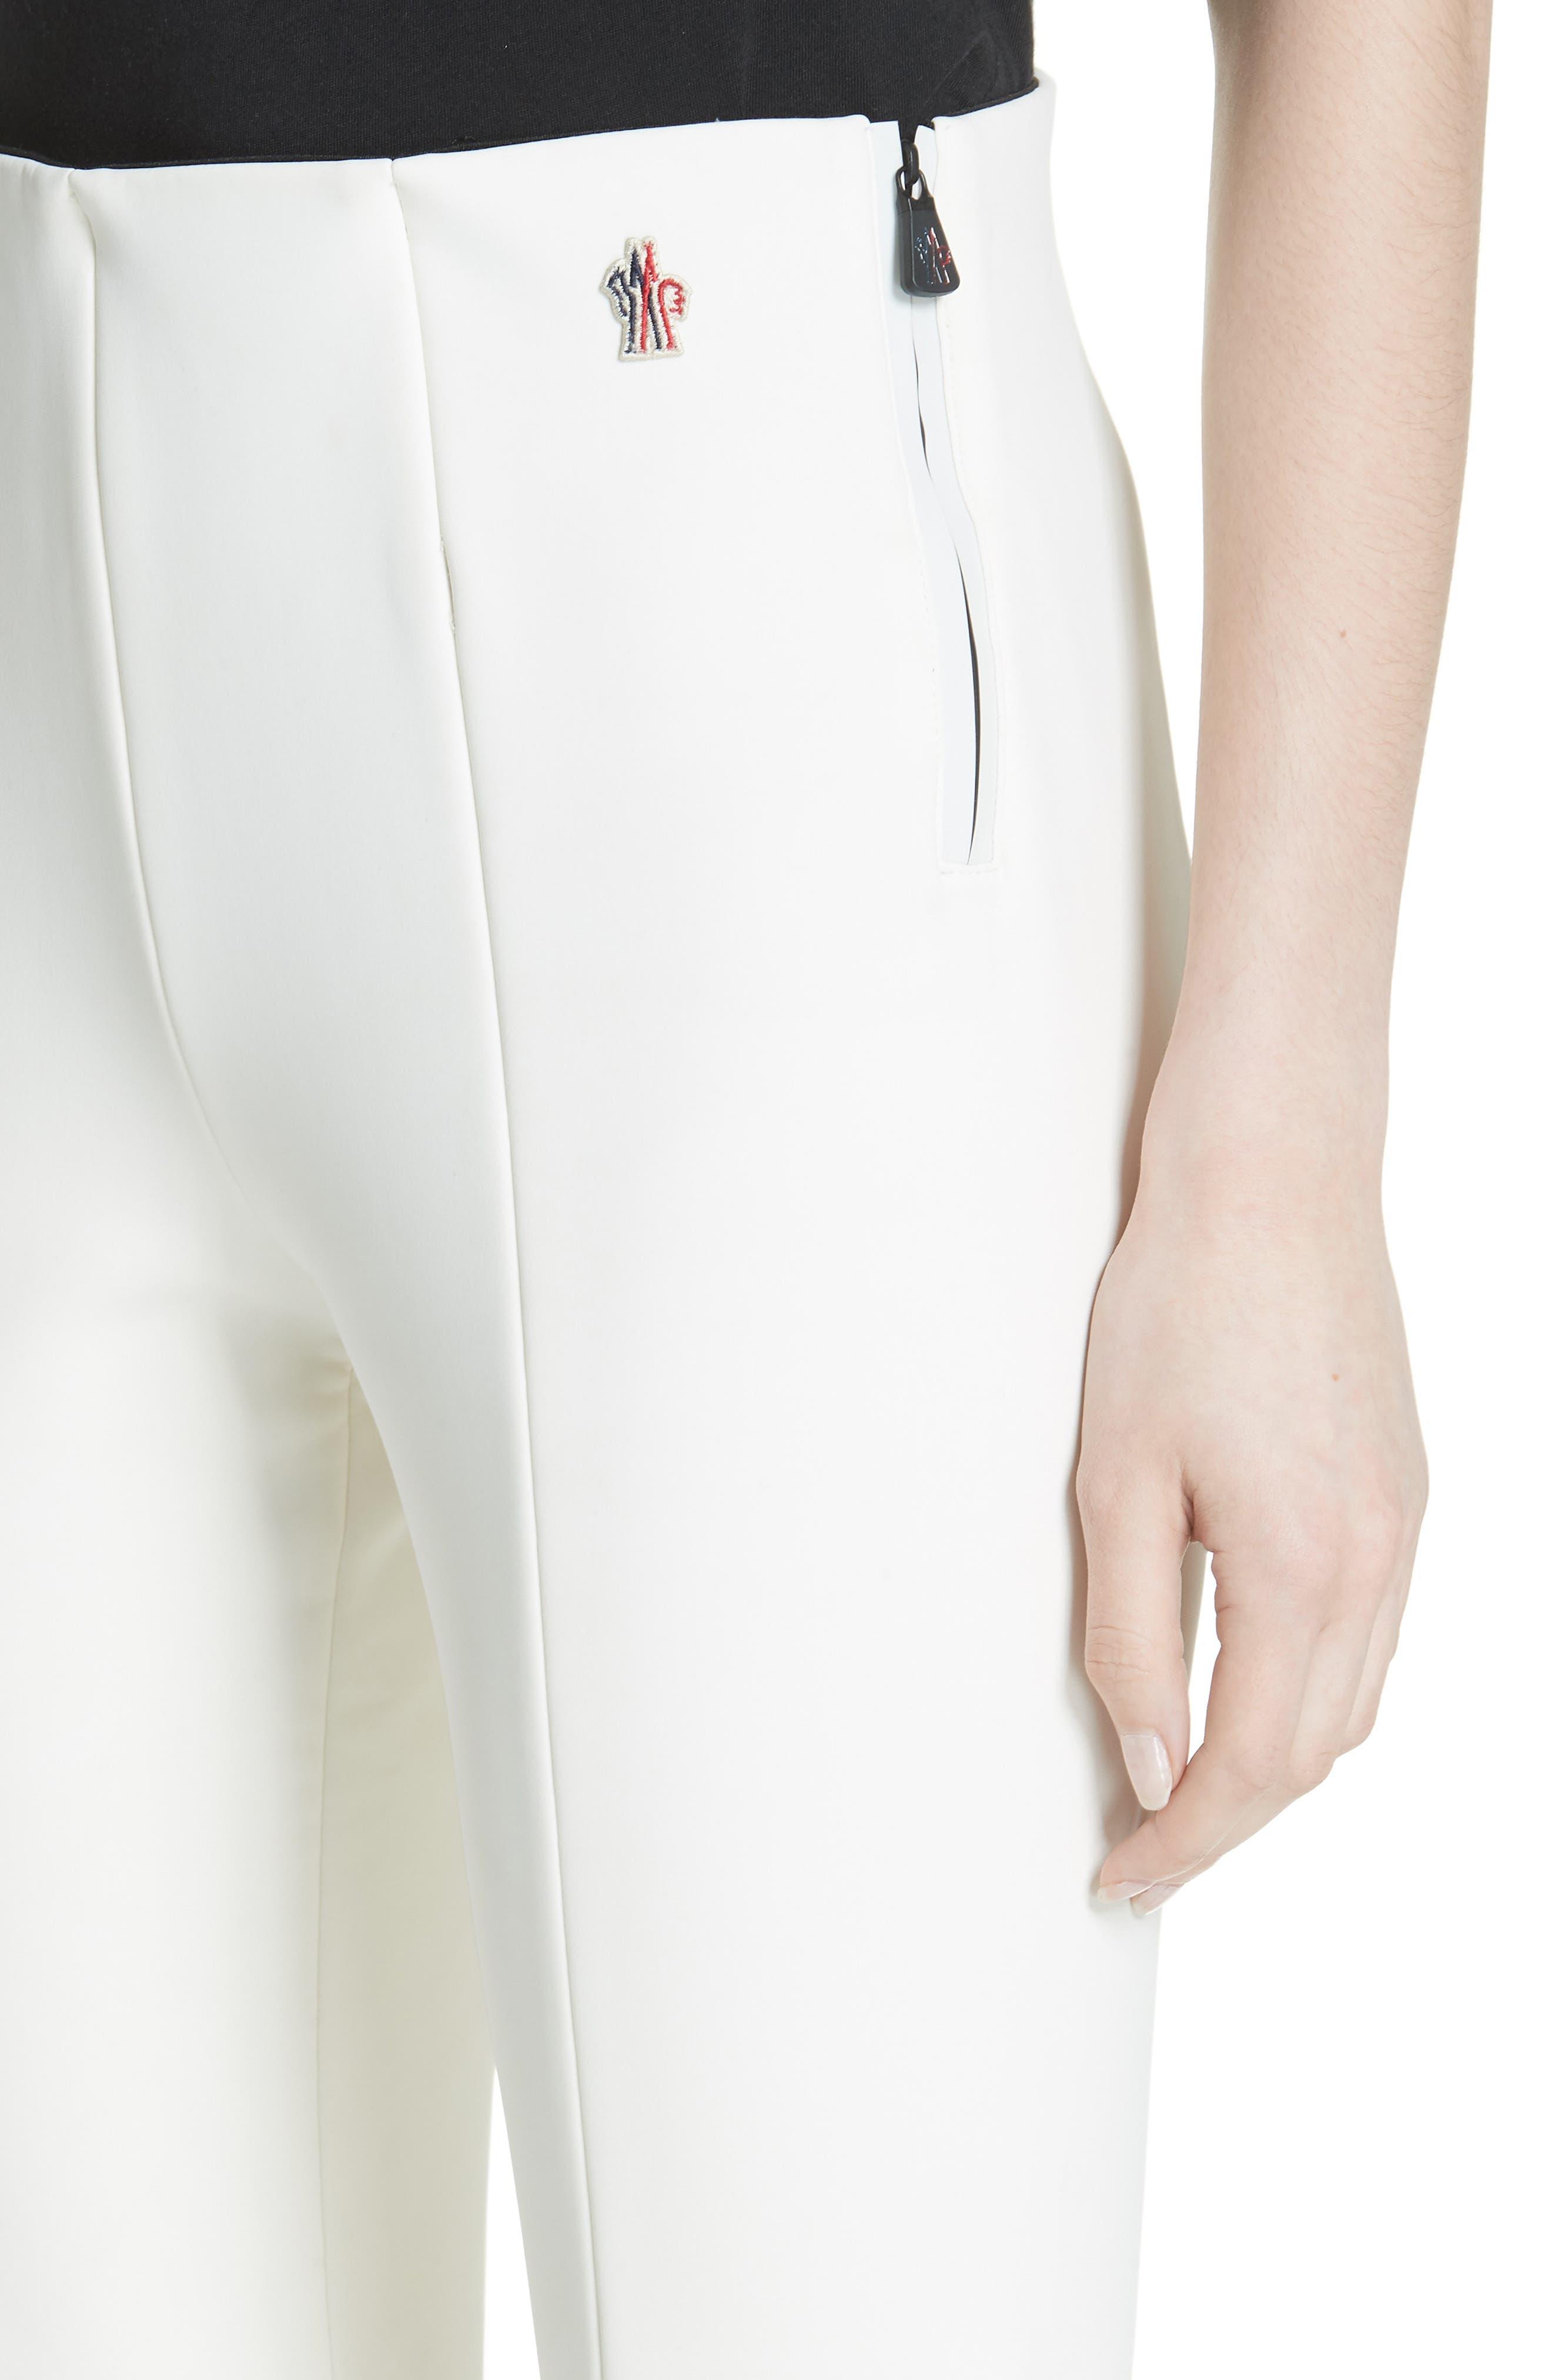 MONCLER, Skinny Stretch Ski Pants, Alternate thumbnail 4, color, WHITE